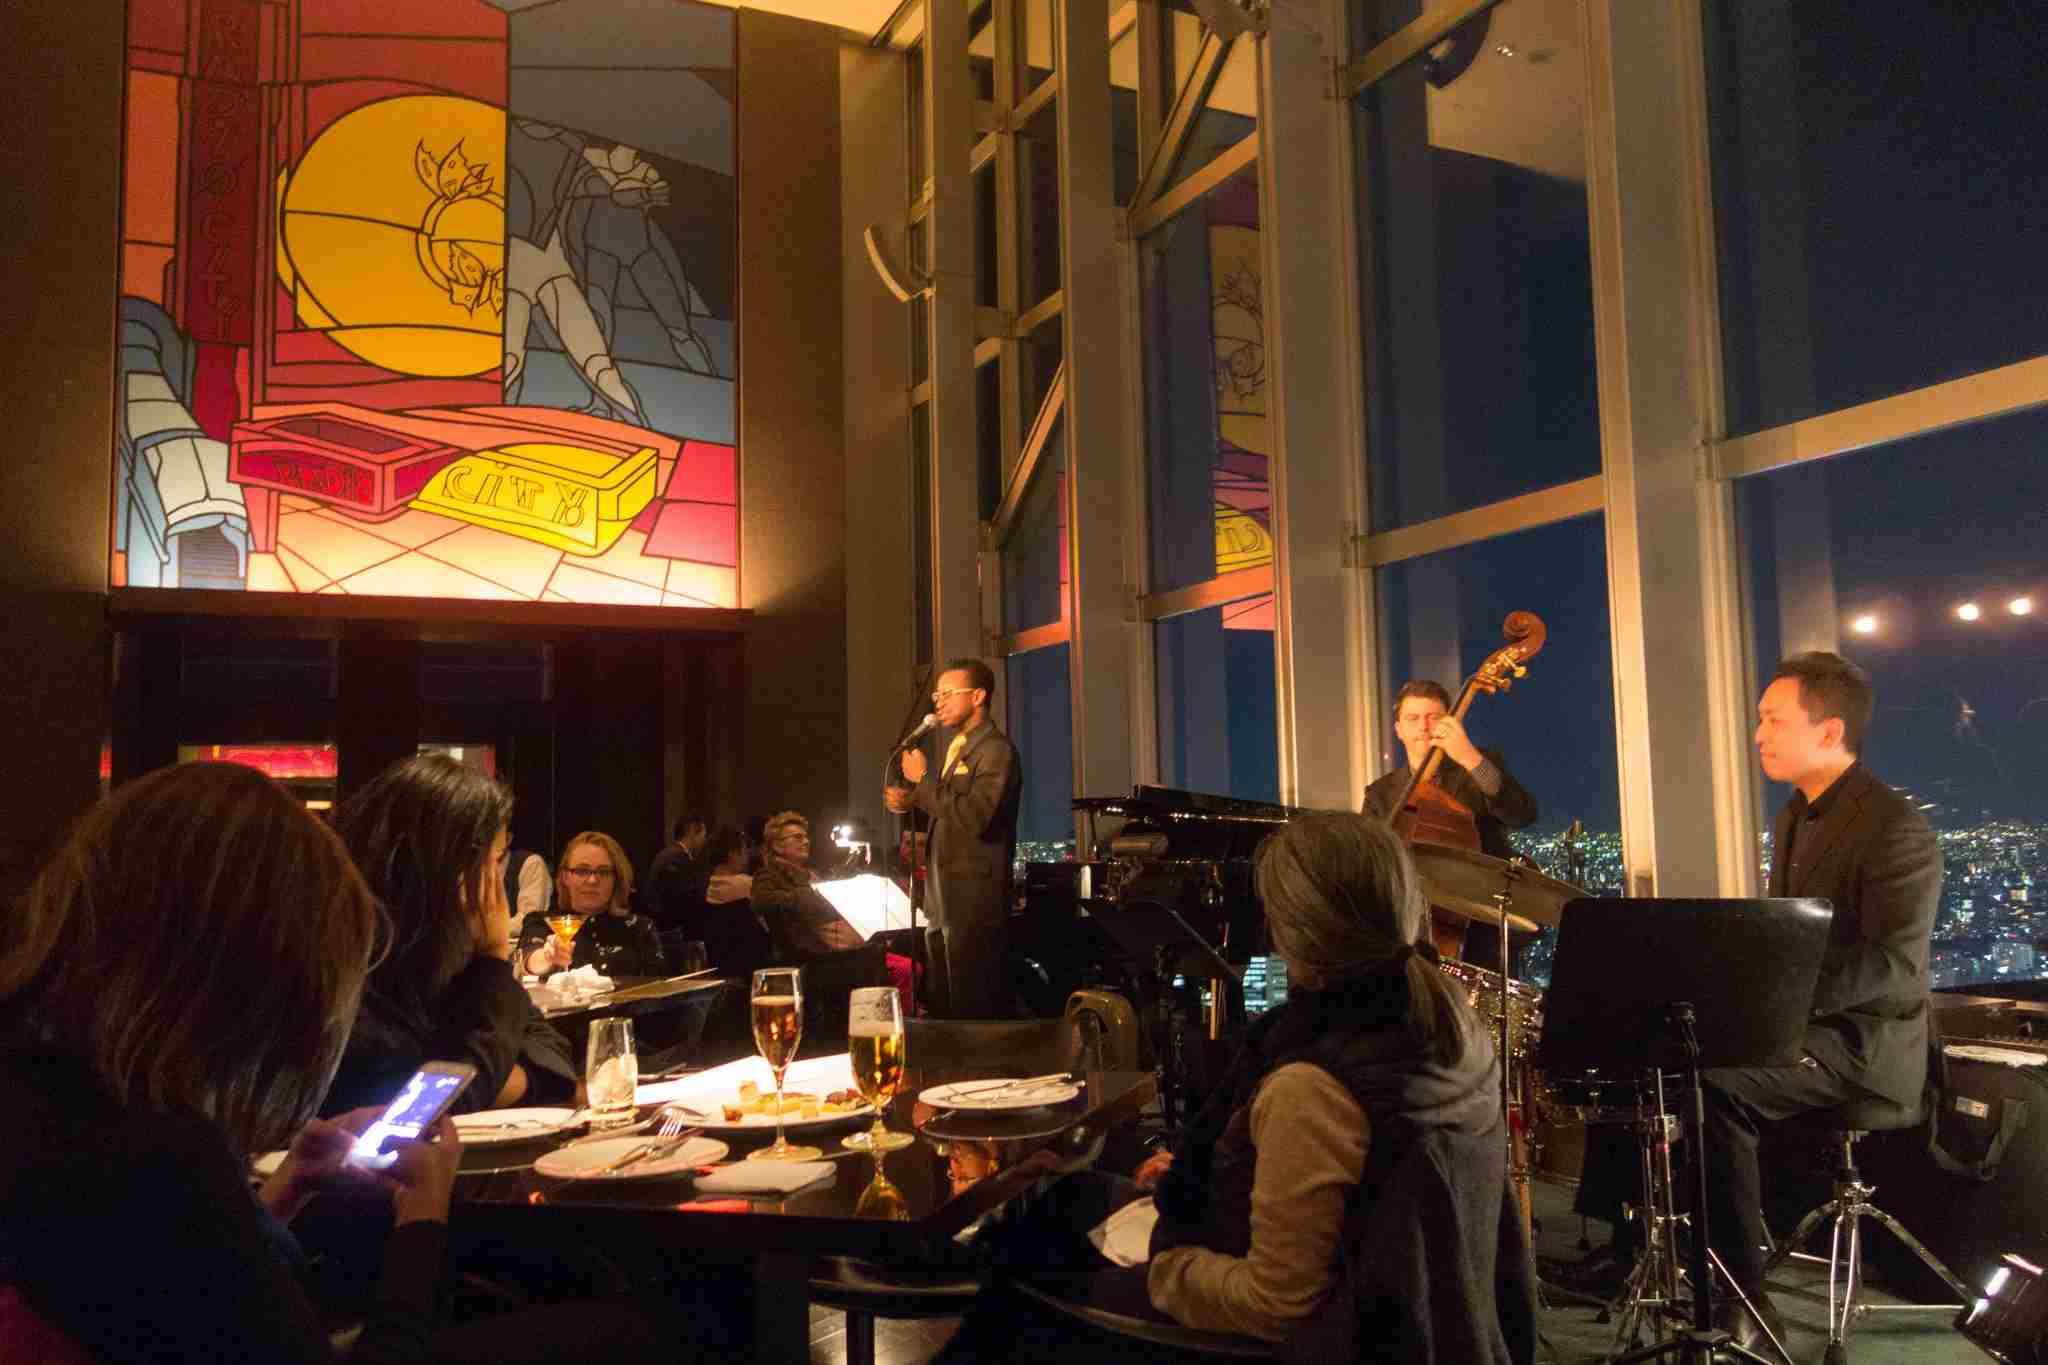 "When in doubt, head to the nearest jazz club. Image courtesy of Kent Wang via <a href=""https://www.flickr.com/photos/kentwang/16171988185/in/photolist-qD4EEv-8esypi-82sGQ2-82vNLQ-Ja9hdu-jbjaSG-8evQQL-jbjorE-8esvne-8evMn5-7adg9L-8CLHj2-K6xQ8H-jbdsjR-8evMJW-8K2Lp6-L6RdJ-8esxaM-8eswrT-6zS7Aa-6zWoBY-L6QHL-5gwipZ-CELv4x-5gADzW-8eswPT-jbi5tC-L6VVa-L6S1C-8esvFv-8esxwK-71pECE-jbfRbC-5gAEwW-GcHTBV-L6Khj-fvHNJc-jbfE3f-fvHJpp-fvHQhD-L6GUN-L6JQd-fvHBiZ-fvHFkD-xqA92-fvHKL8-jbeDQp-fvY3K7-fvYbyC-wr47H"" target=""_blank"">Flickr</a>."